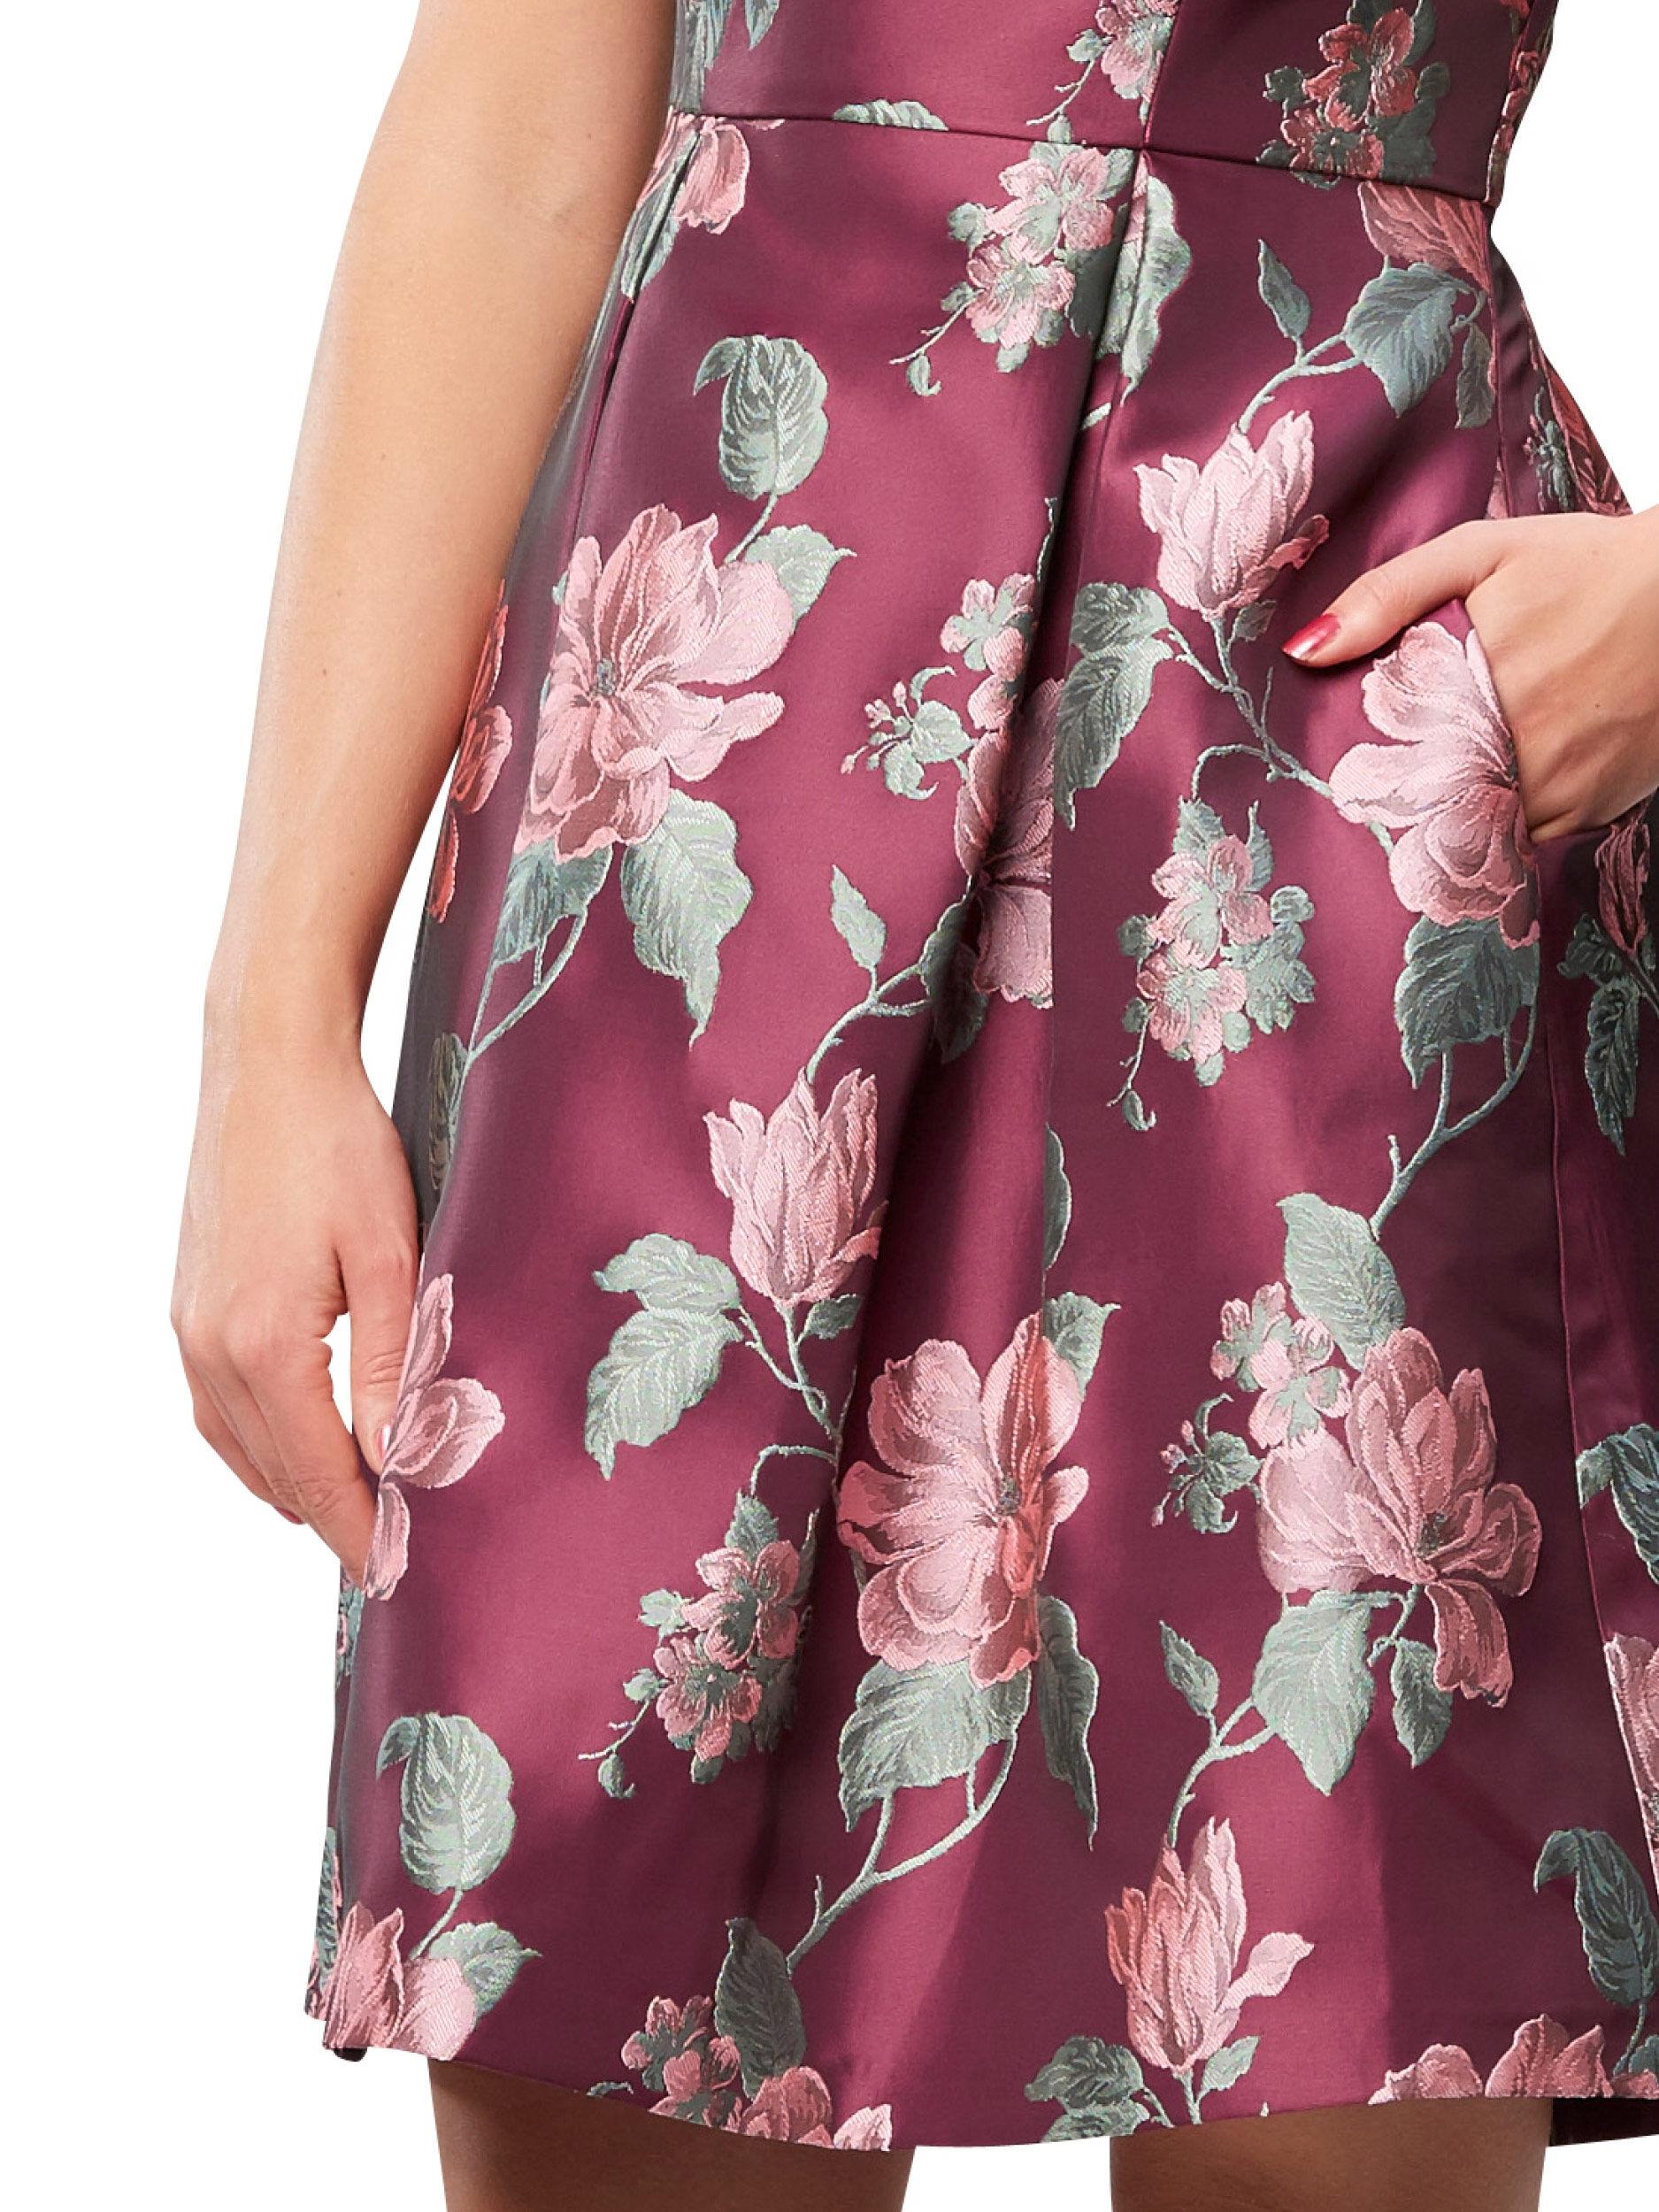 Magnolia Bloom Dress